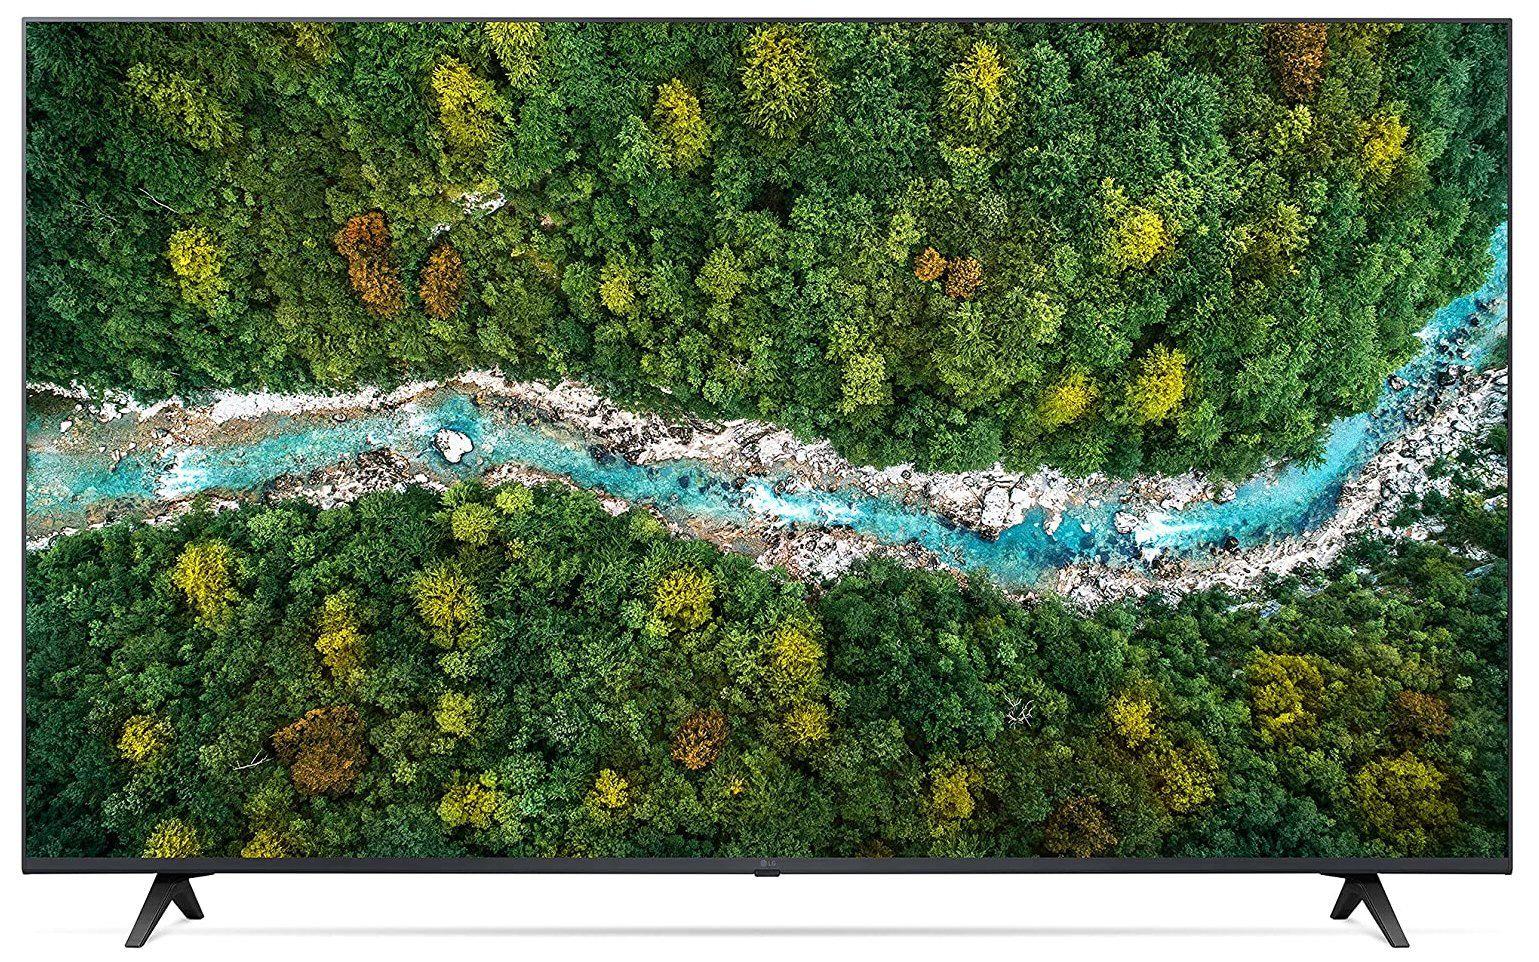 LG 55UP77009LB   55 Zoll UHD Fernseher mit PVR / Time Shift für 499€(statt 669€)